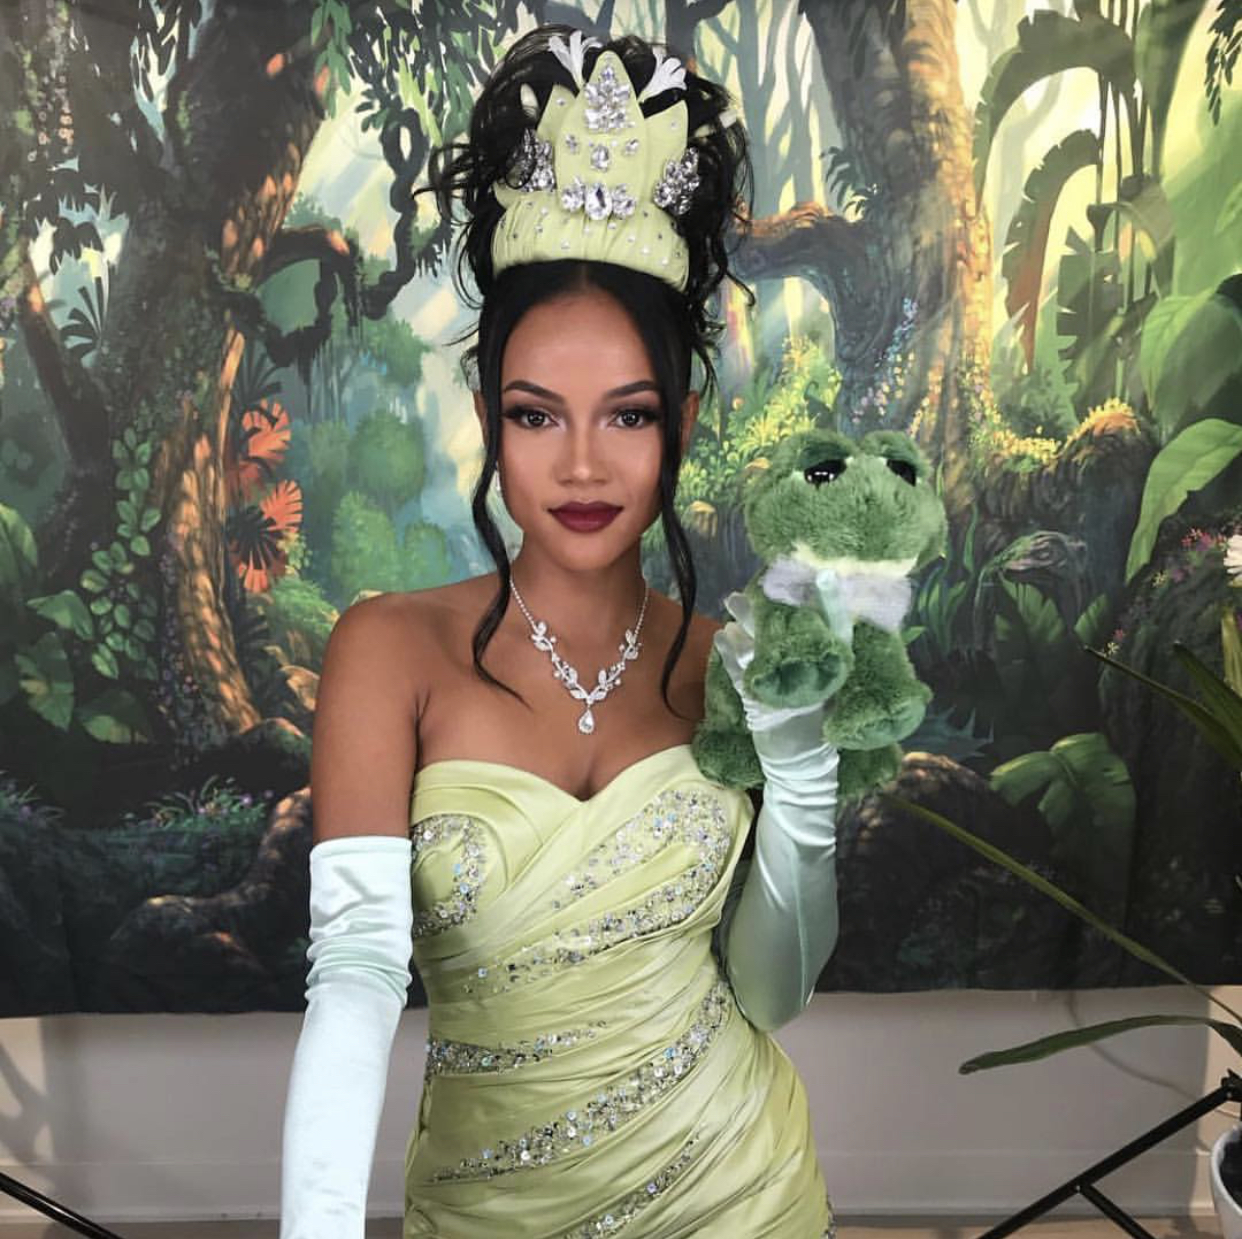 Get The Look: Karrueche Tran Makeup Transformation Into Princess Tiana